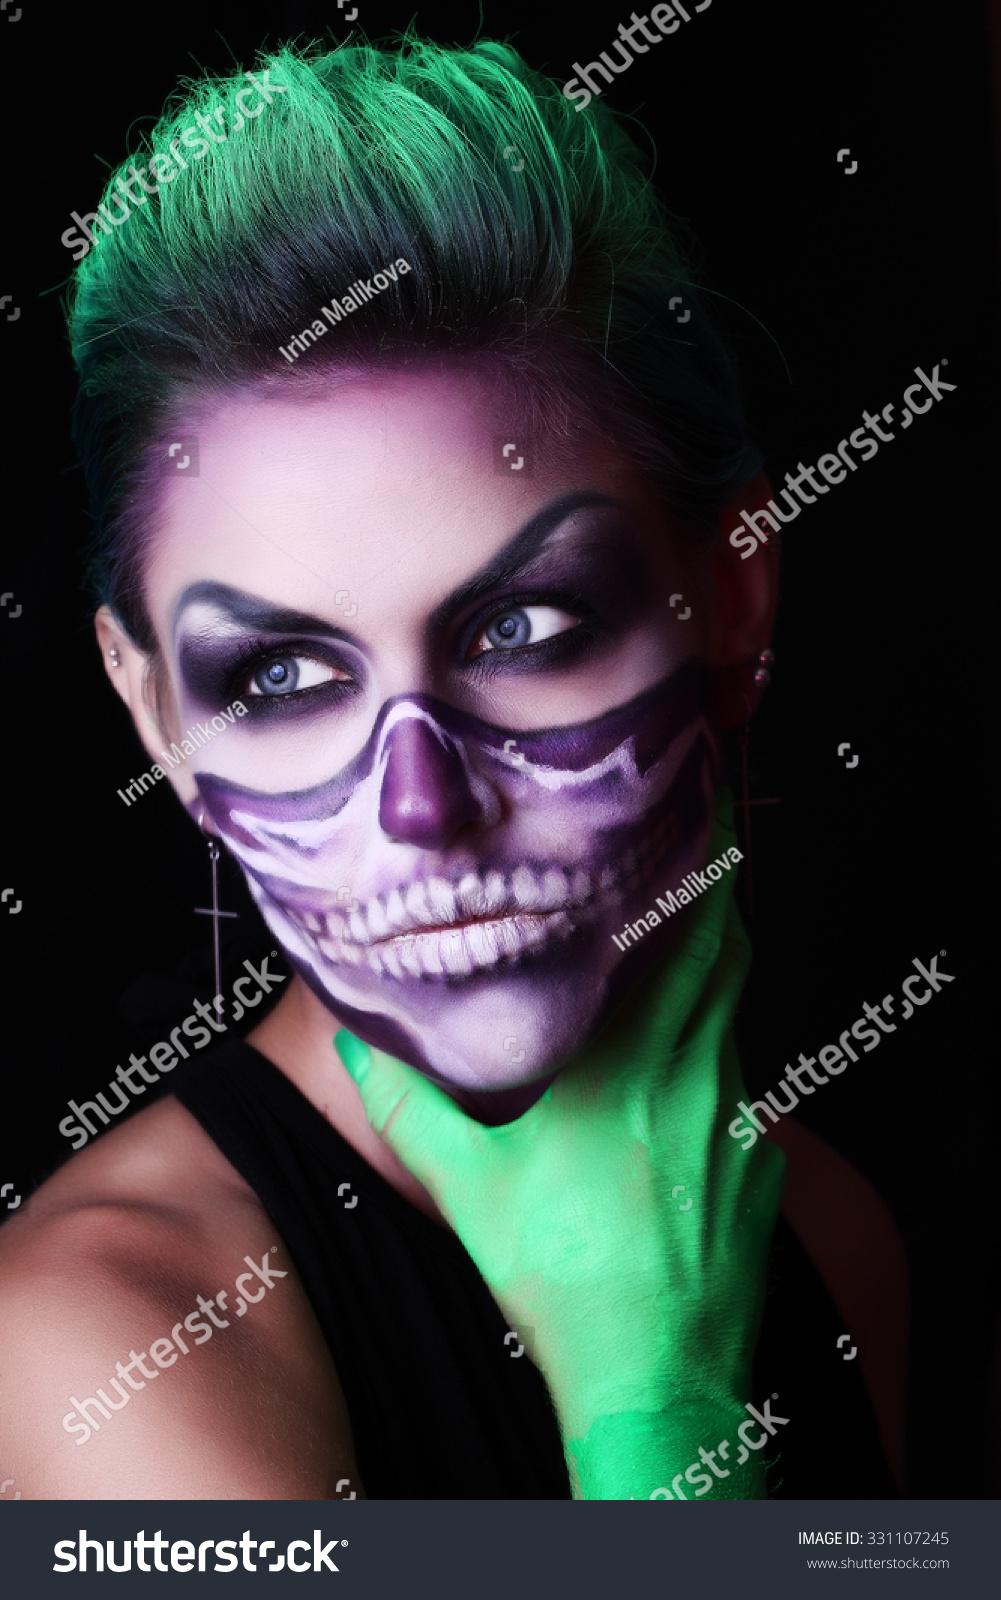 girl image zombie makeup halloween stock photo (edit now) 331107245